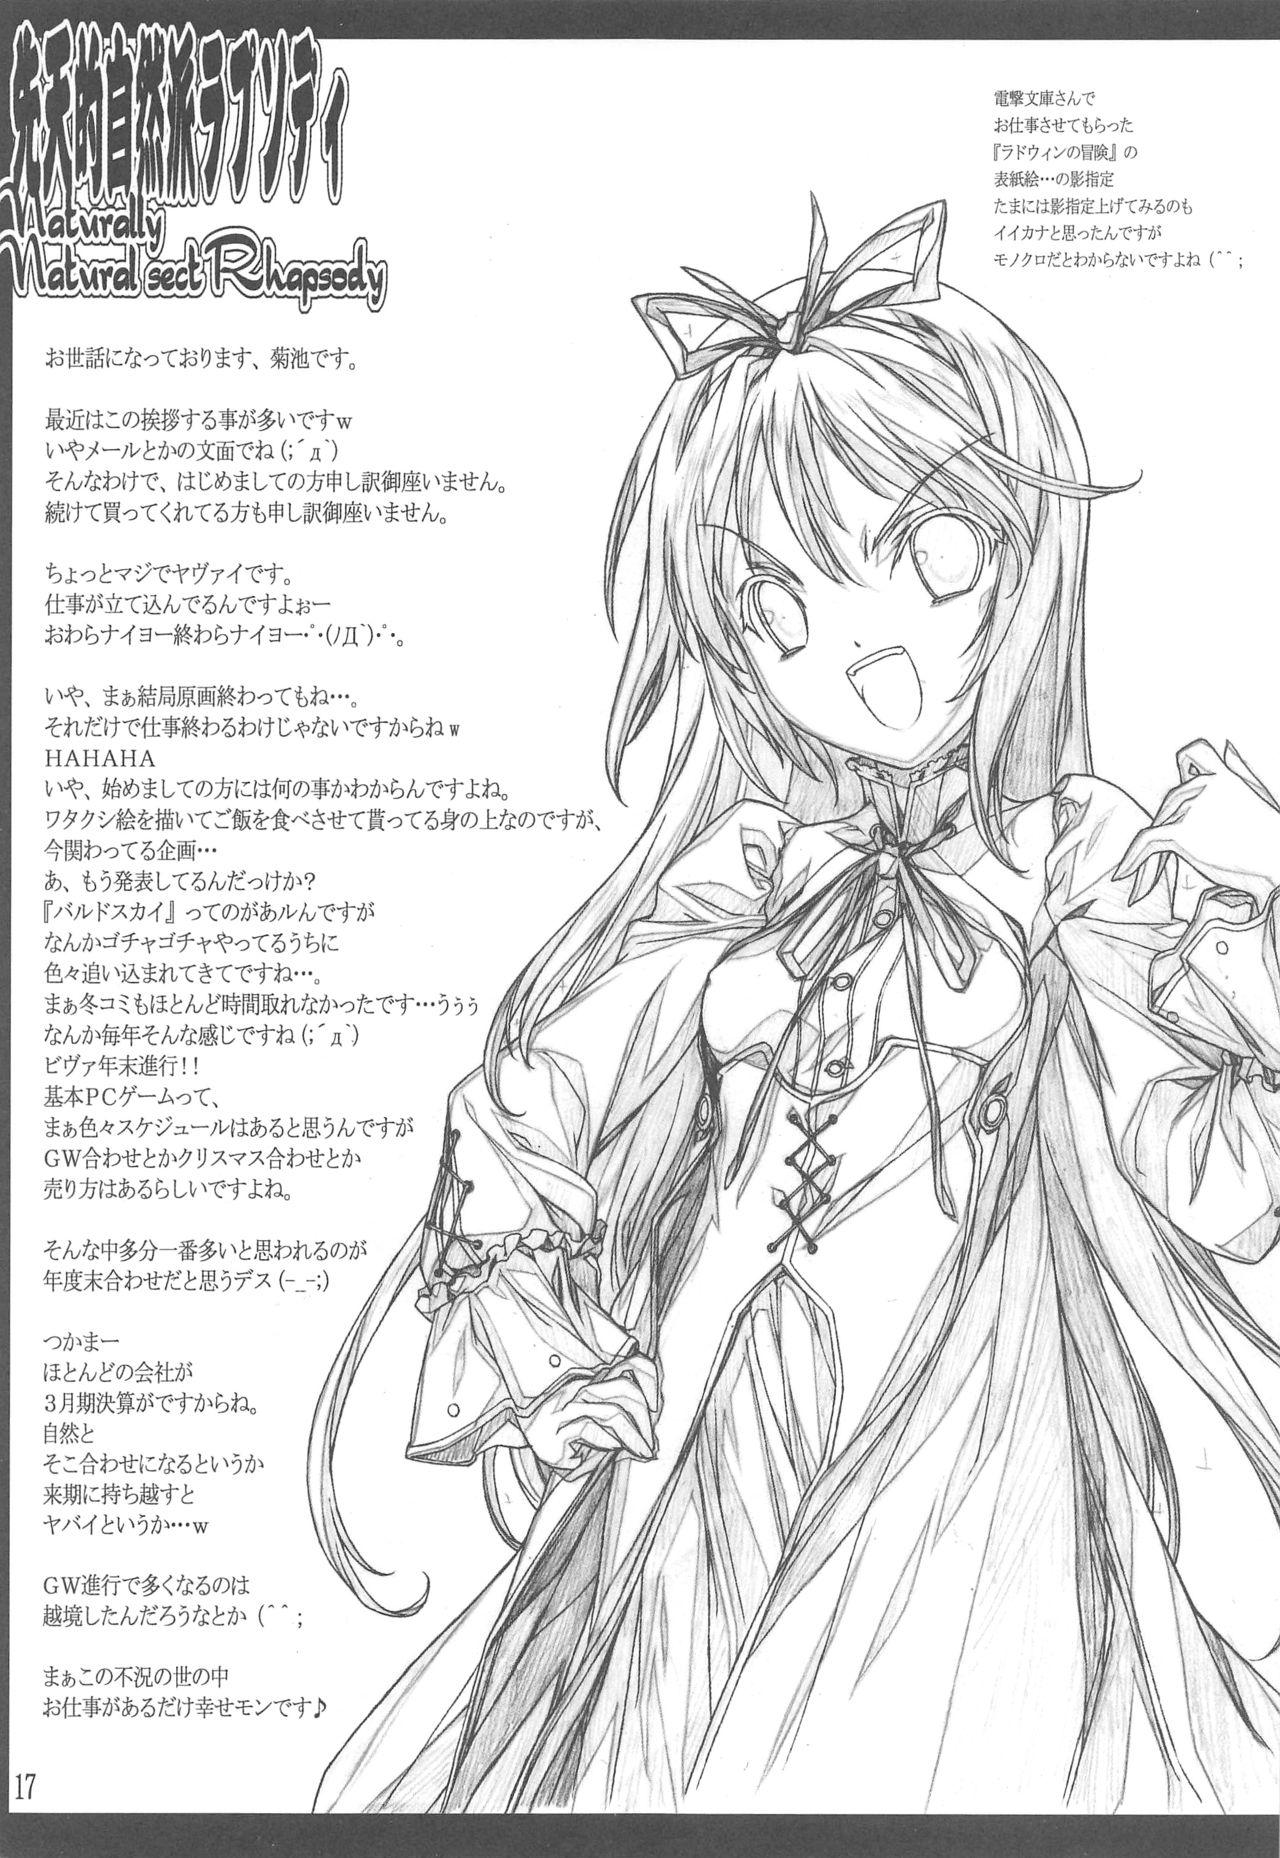 Sententeki Shizenha Rhapsody 17